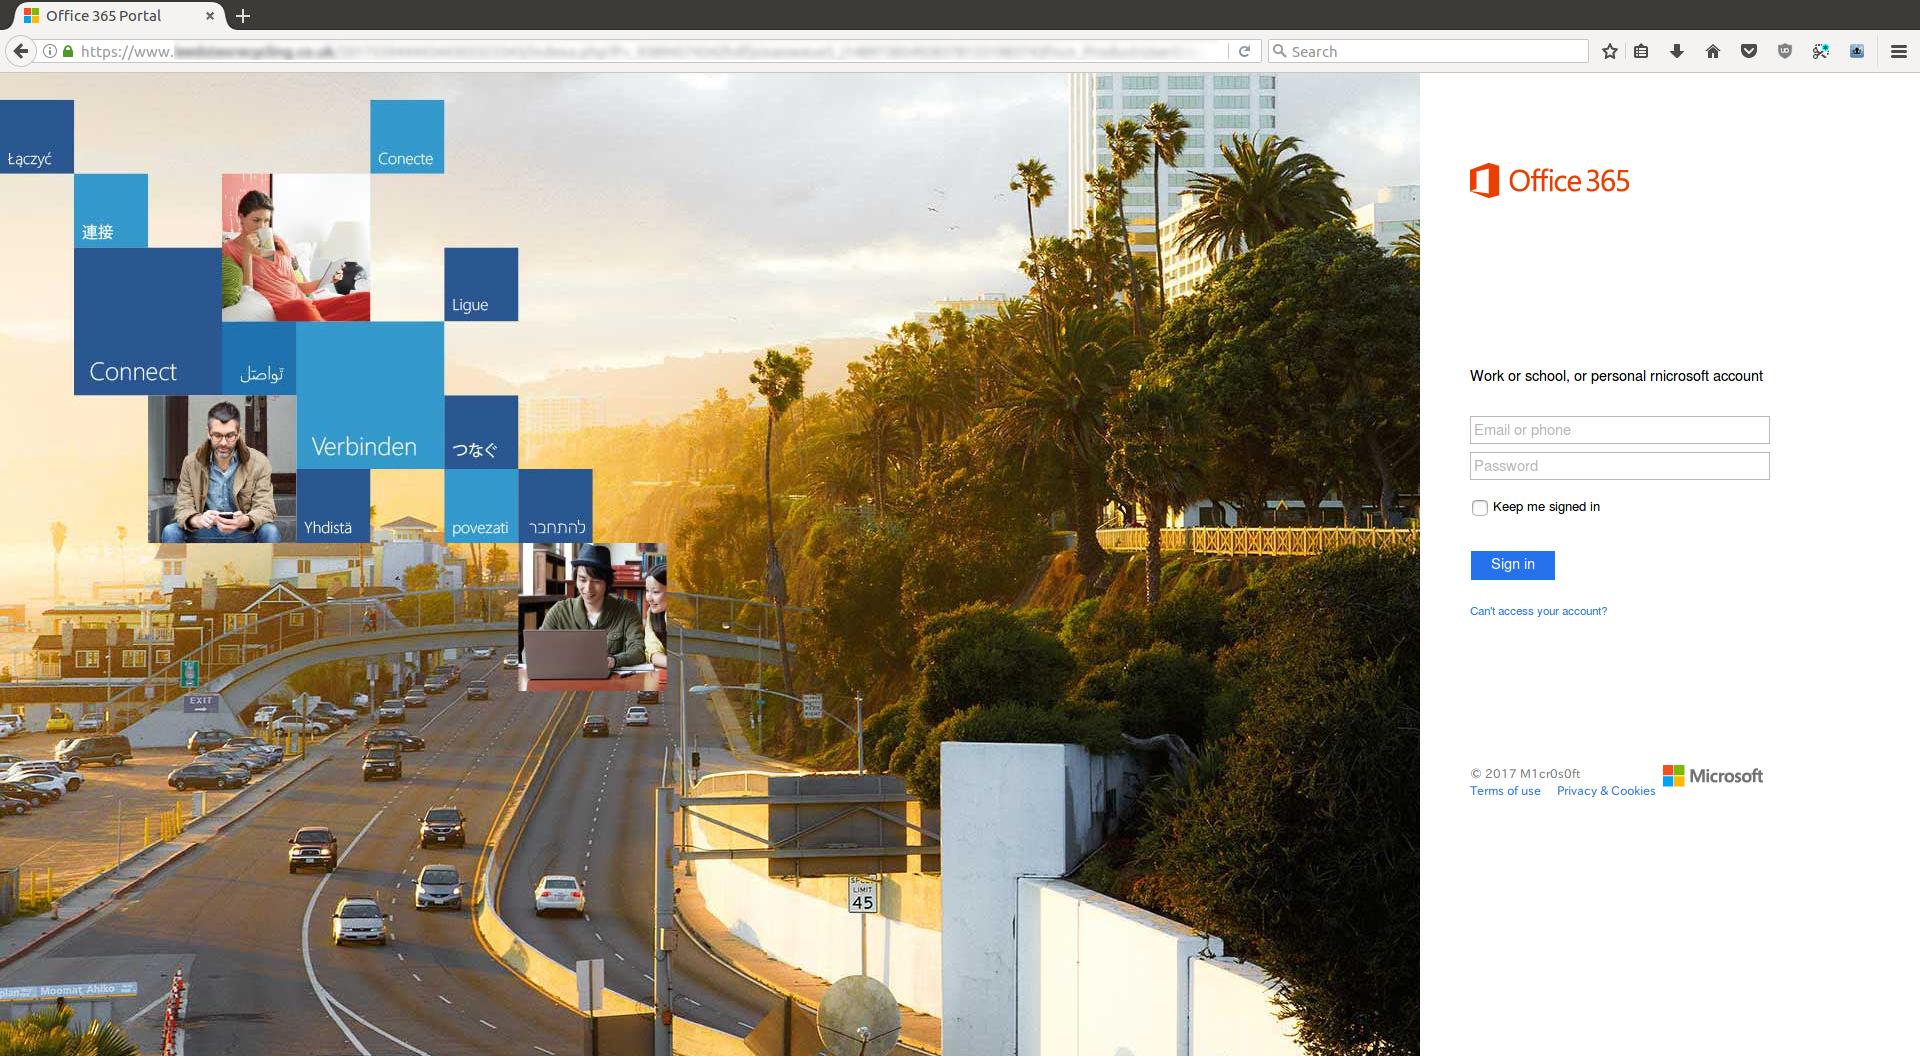 Office 365 Portal - Mozilla Firefox_251.png